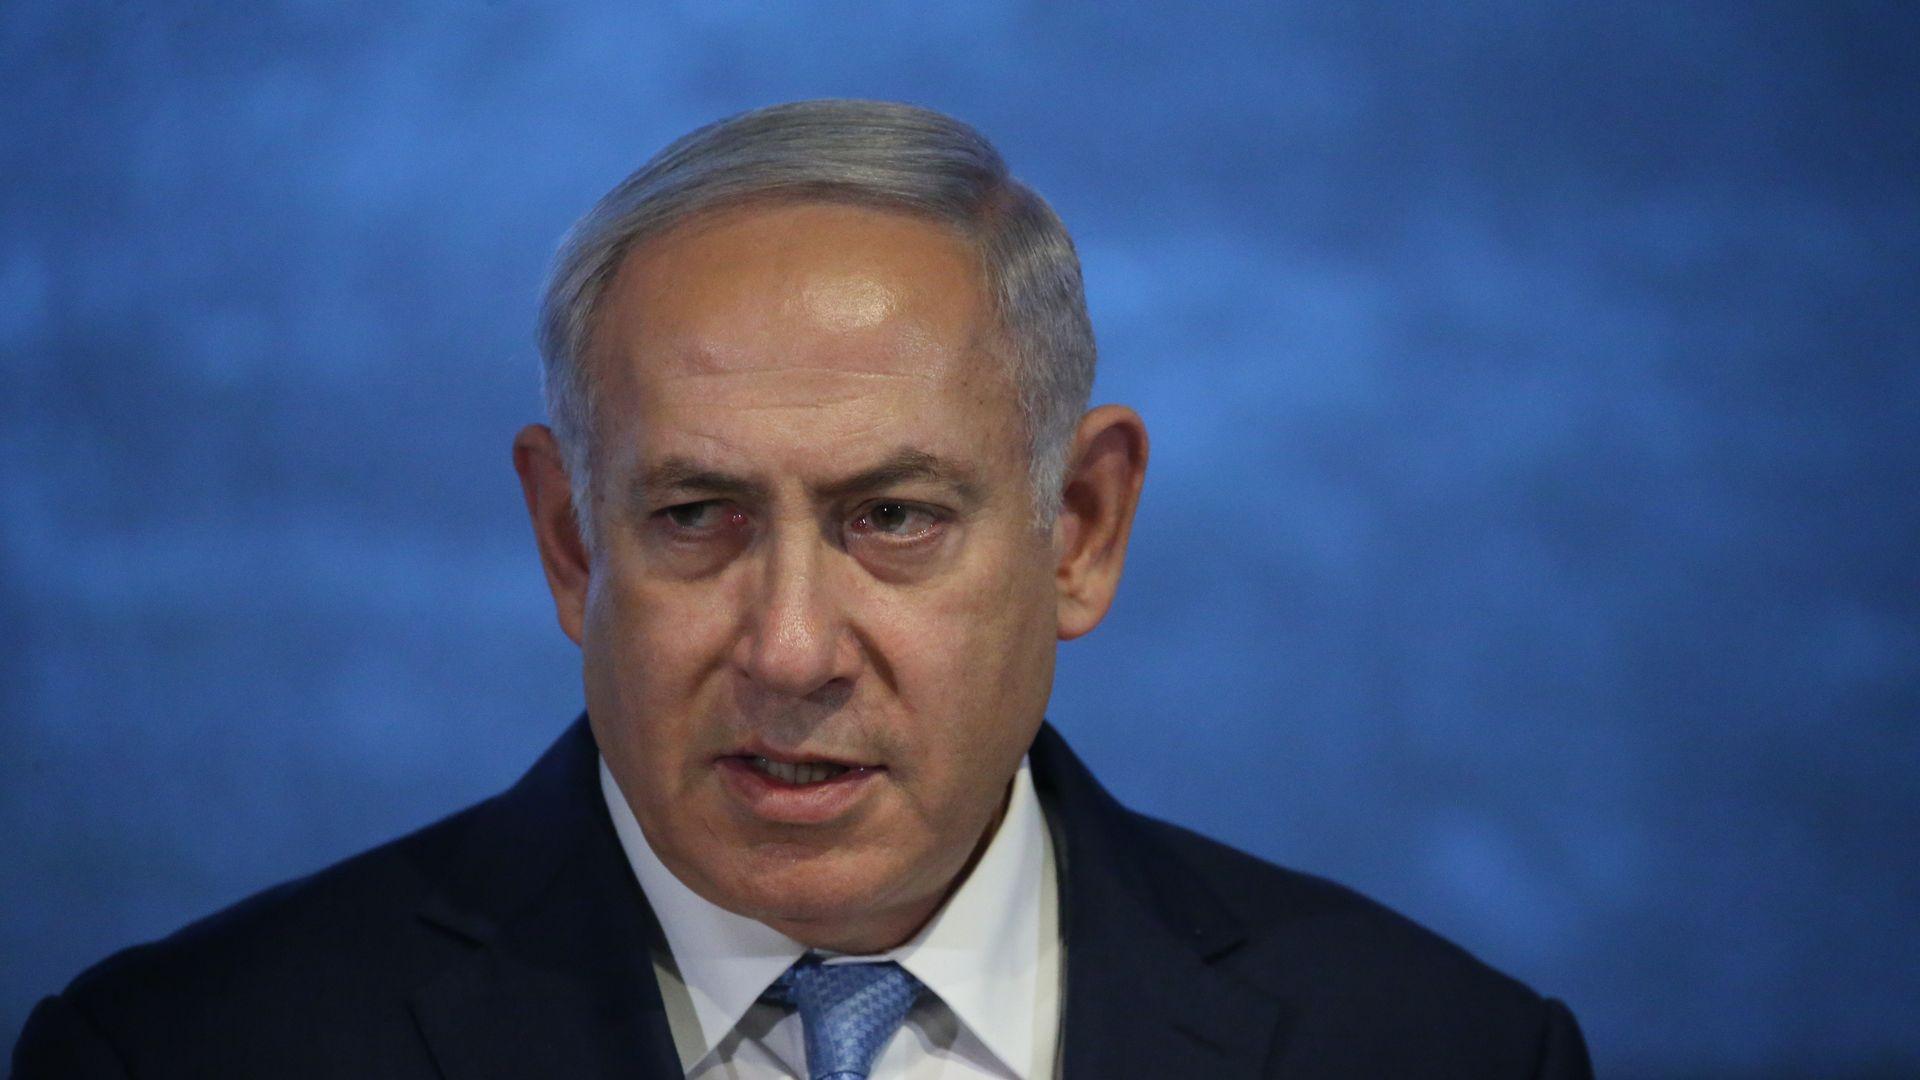 Benjamin Netanyahu before a blue backdrop.